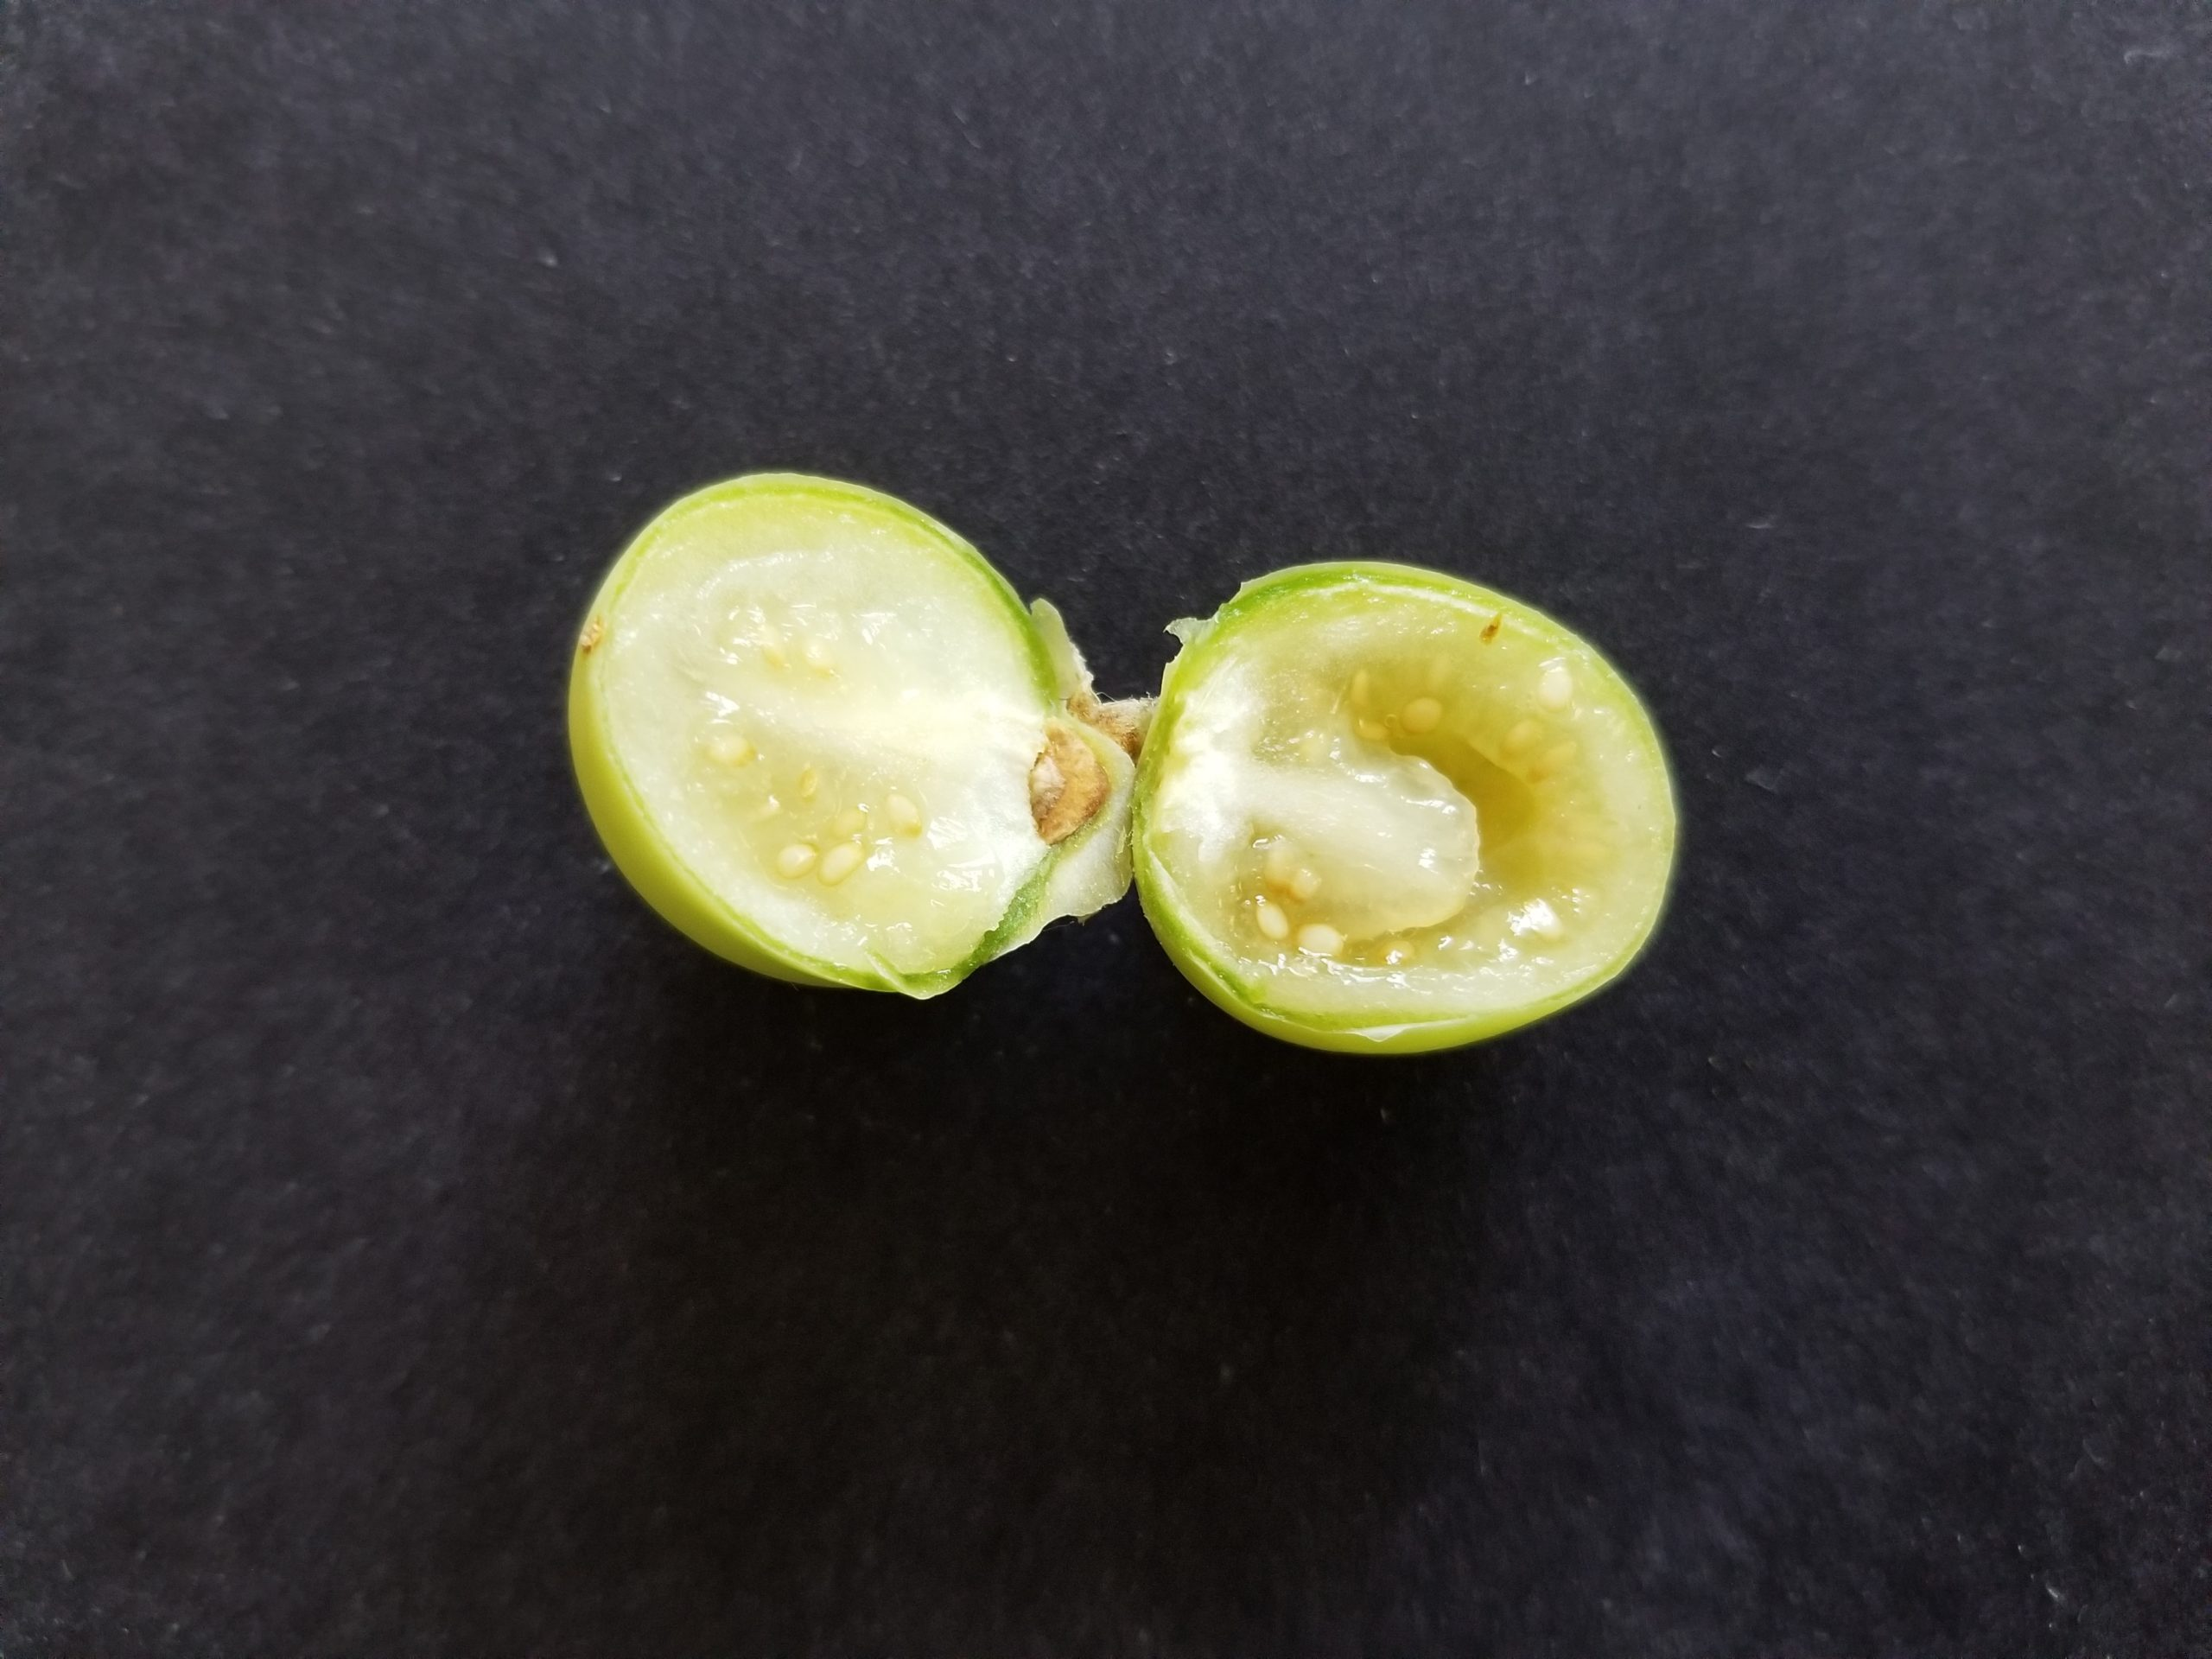 True potato seed ball cut open